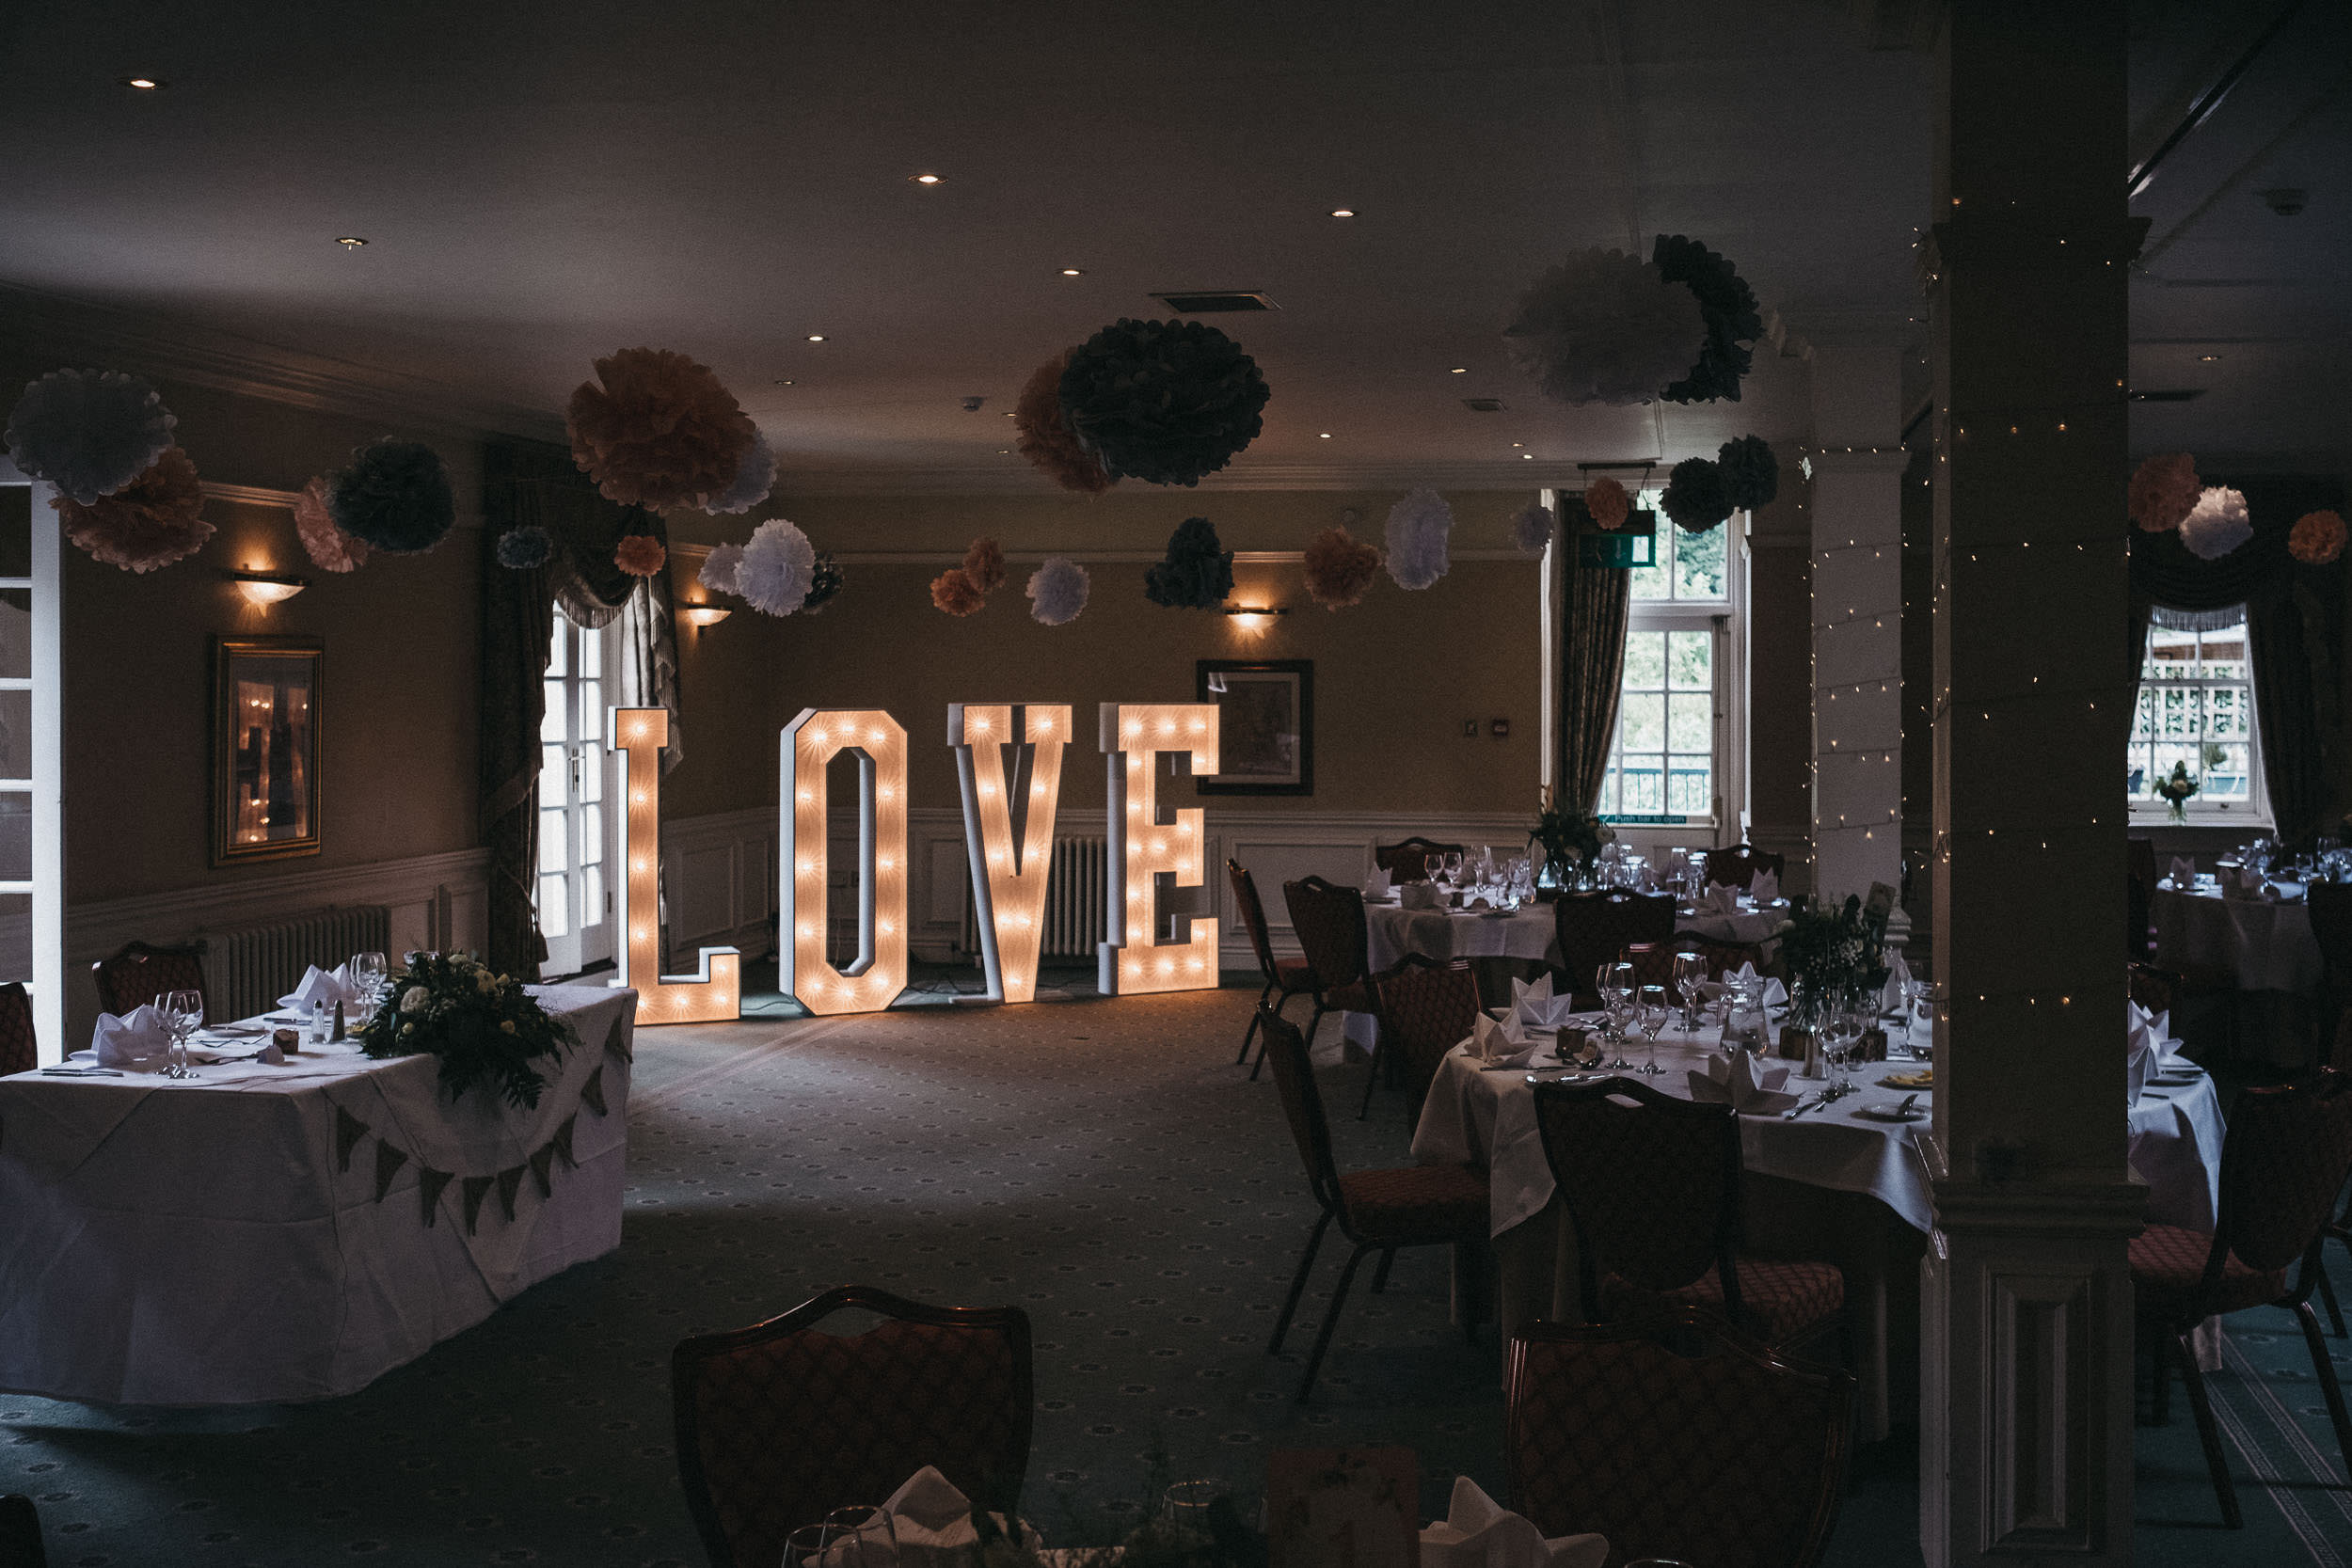 Reception room of Judges at Kirklevington with large Love letters